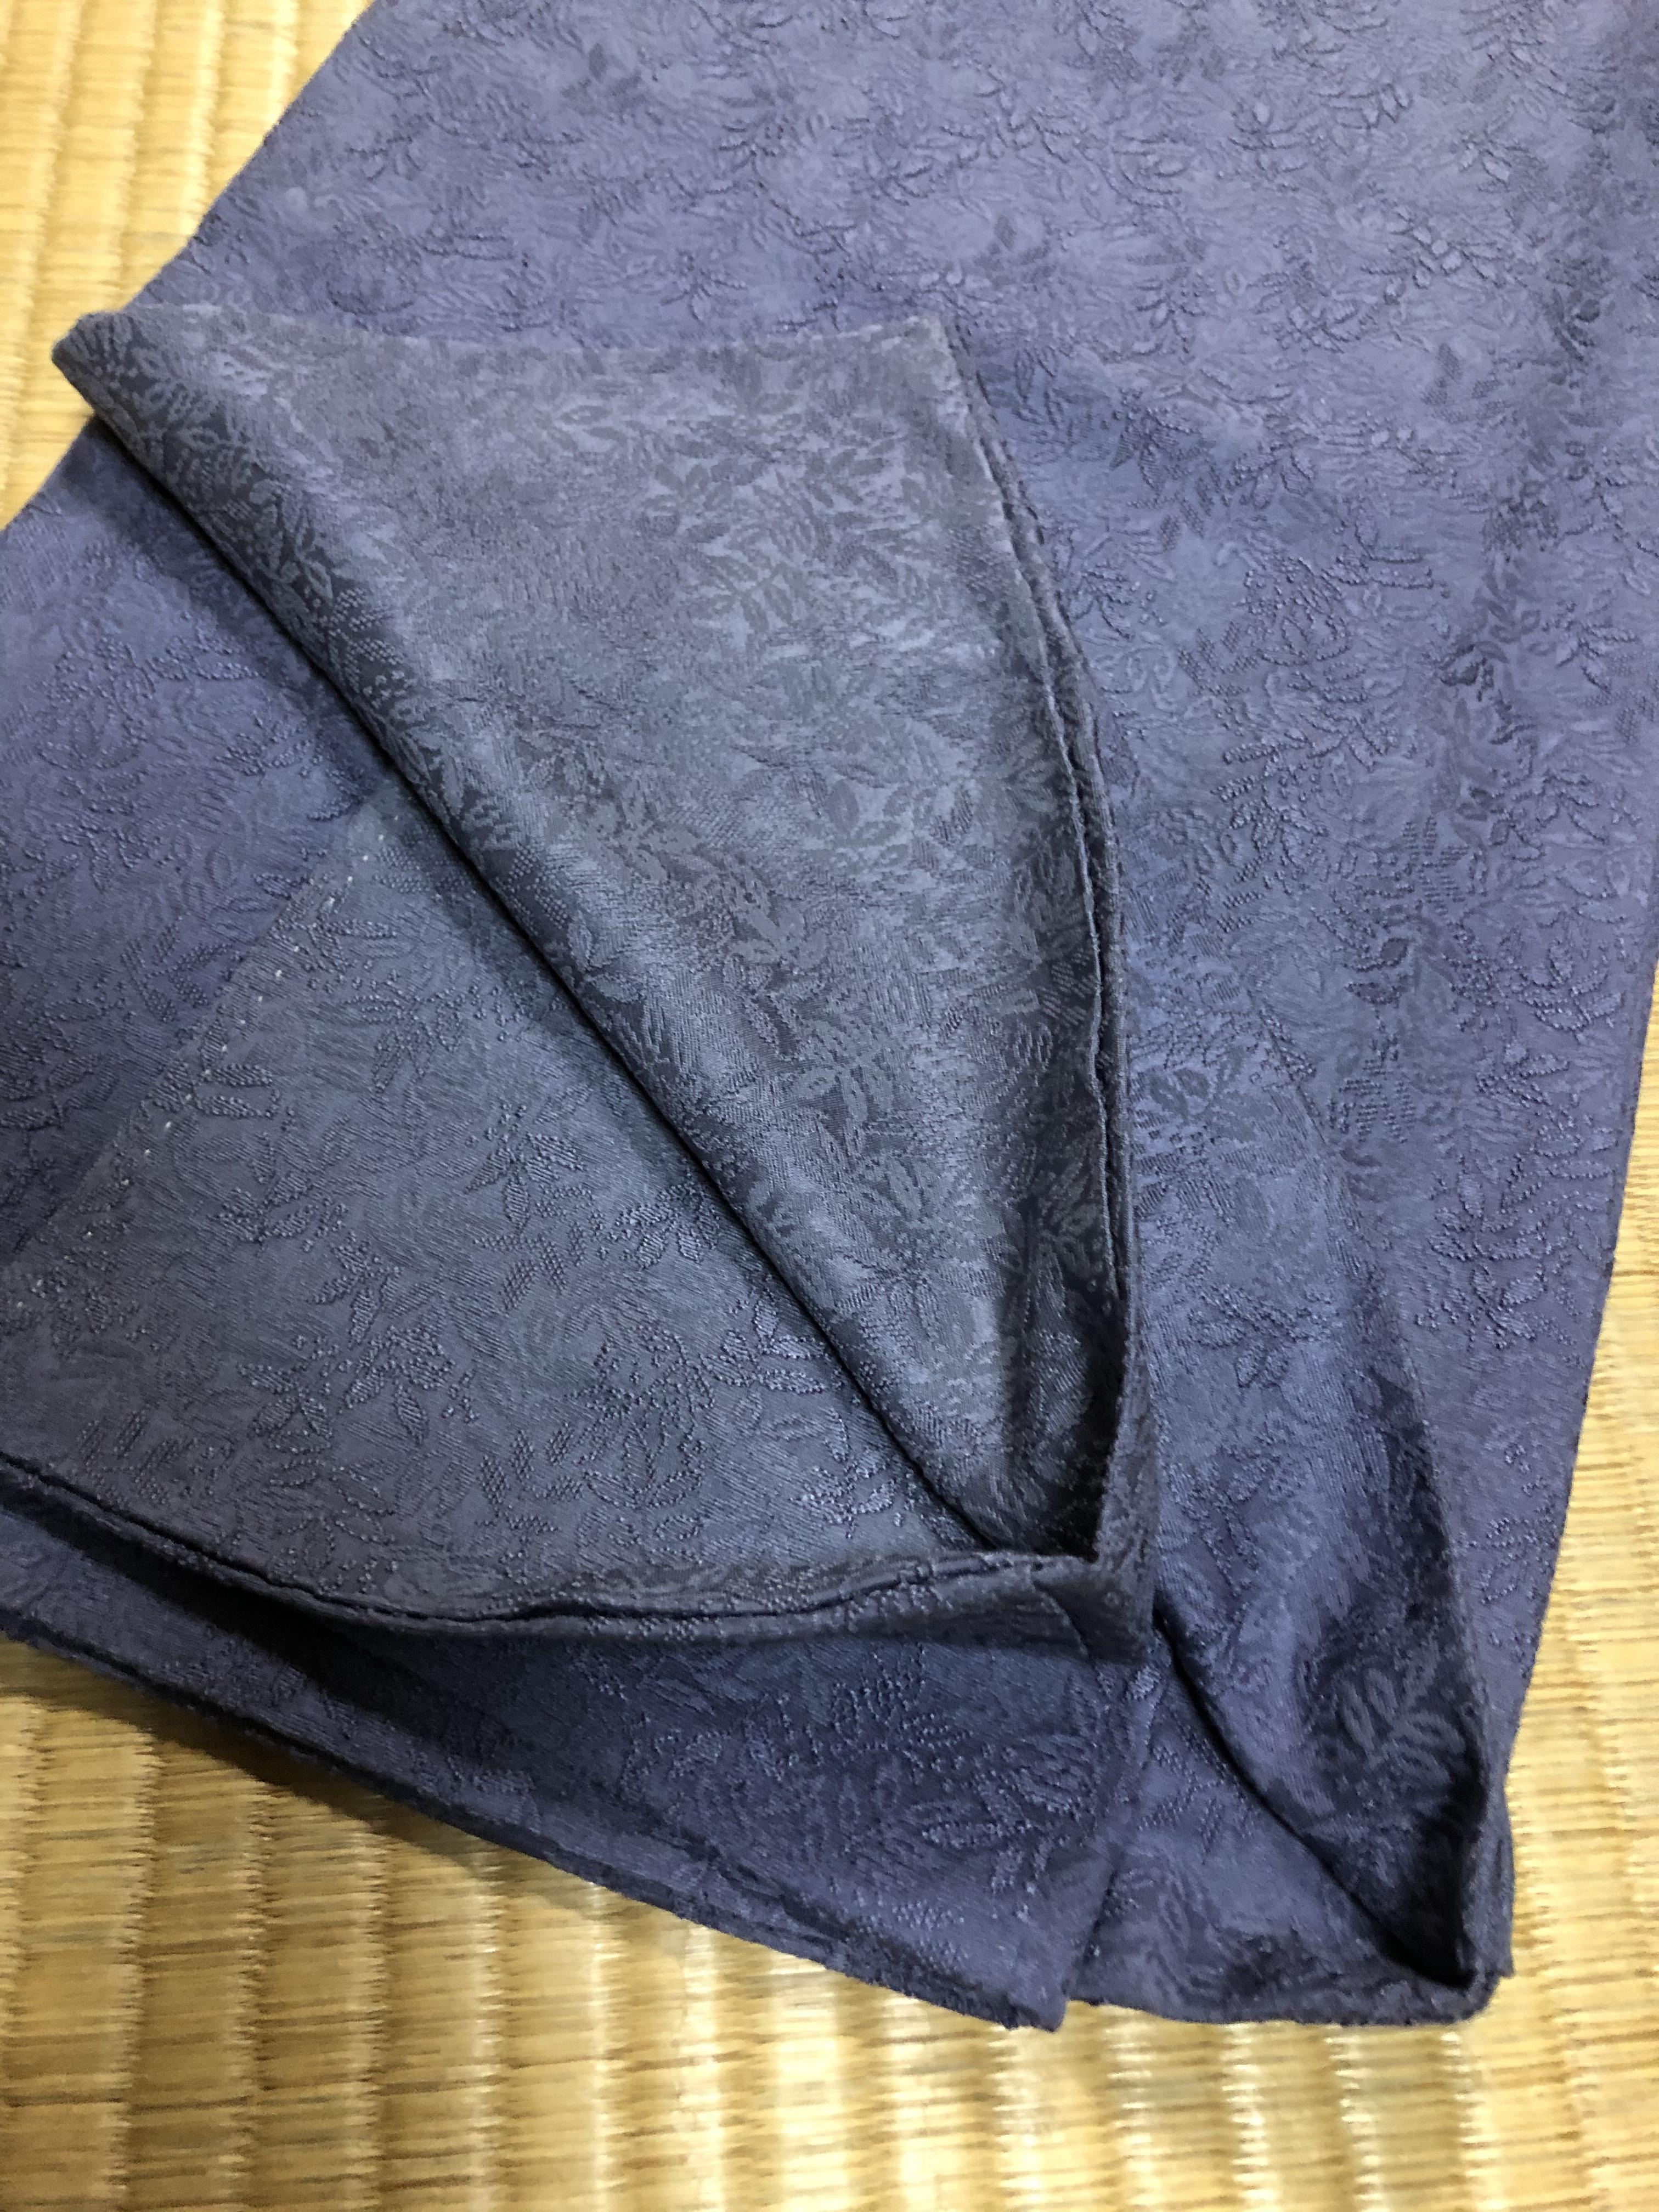 刺繍紋の振袖